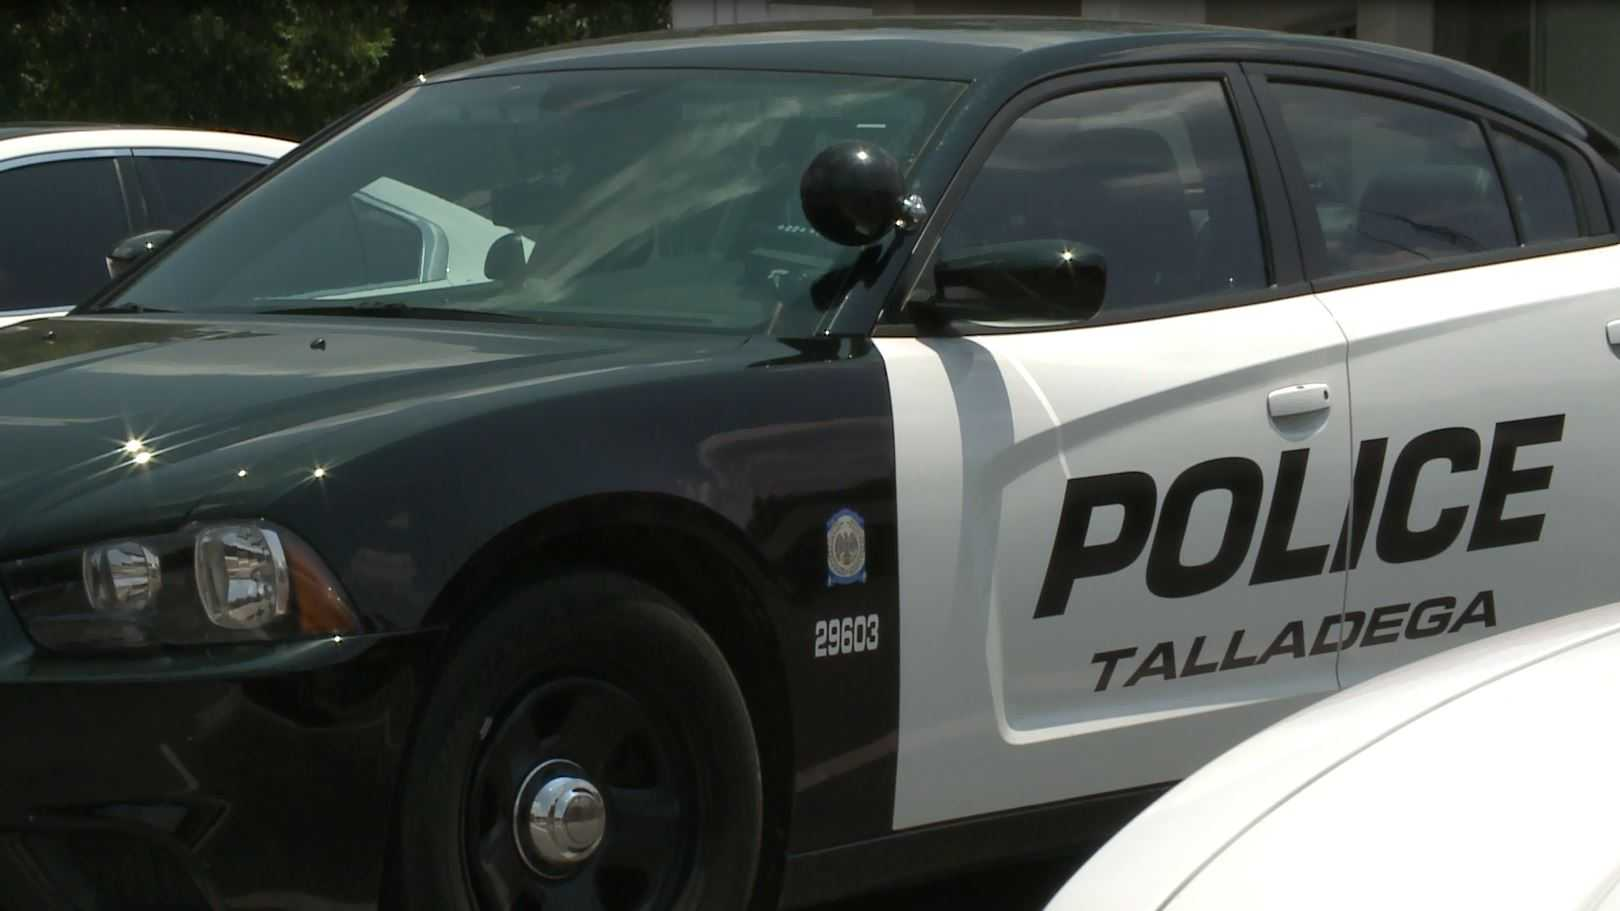 talladega police car